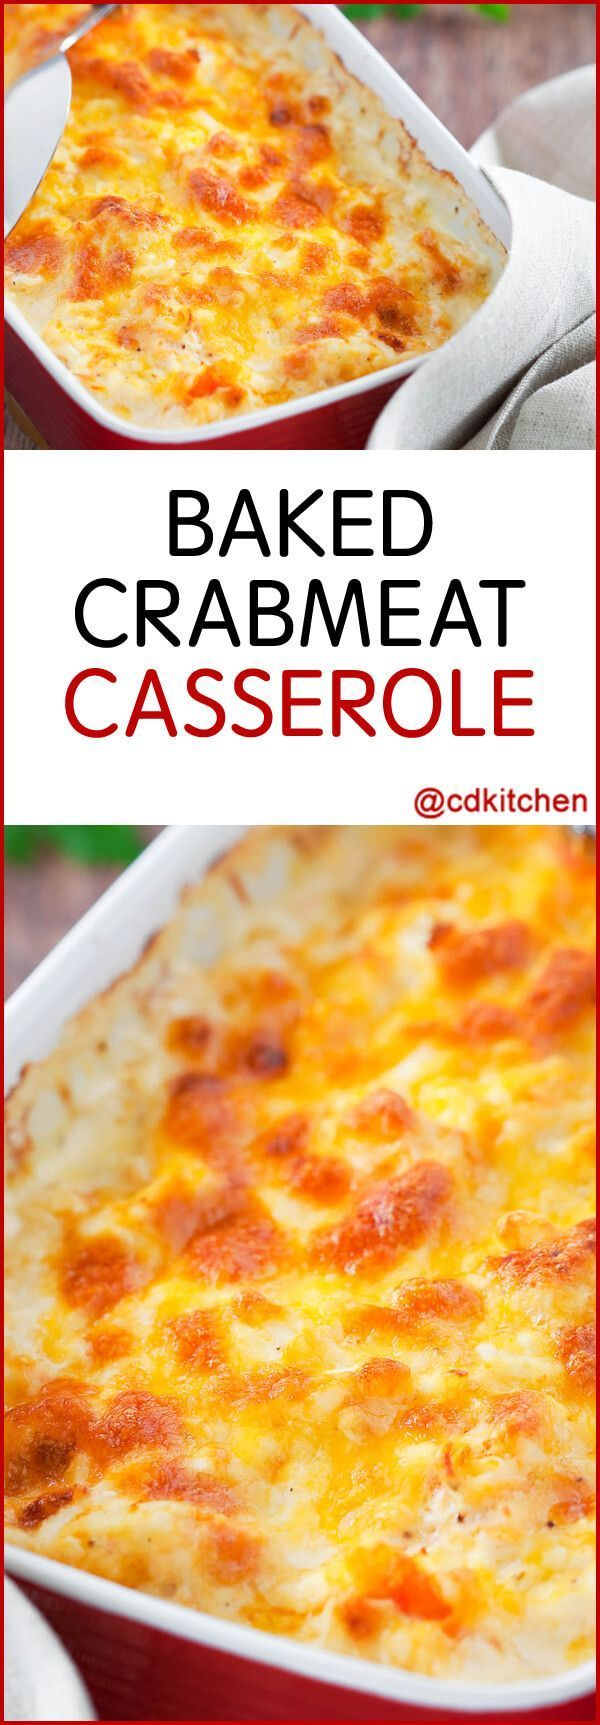 Baked Crabmeat Casserole - Recipe is made with Parmesan cheese, margarine, onion, crabmeat, Dijon mustard, Worcestershire sauce, egg white   CDKitchen.com